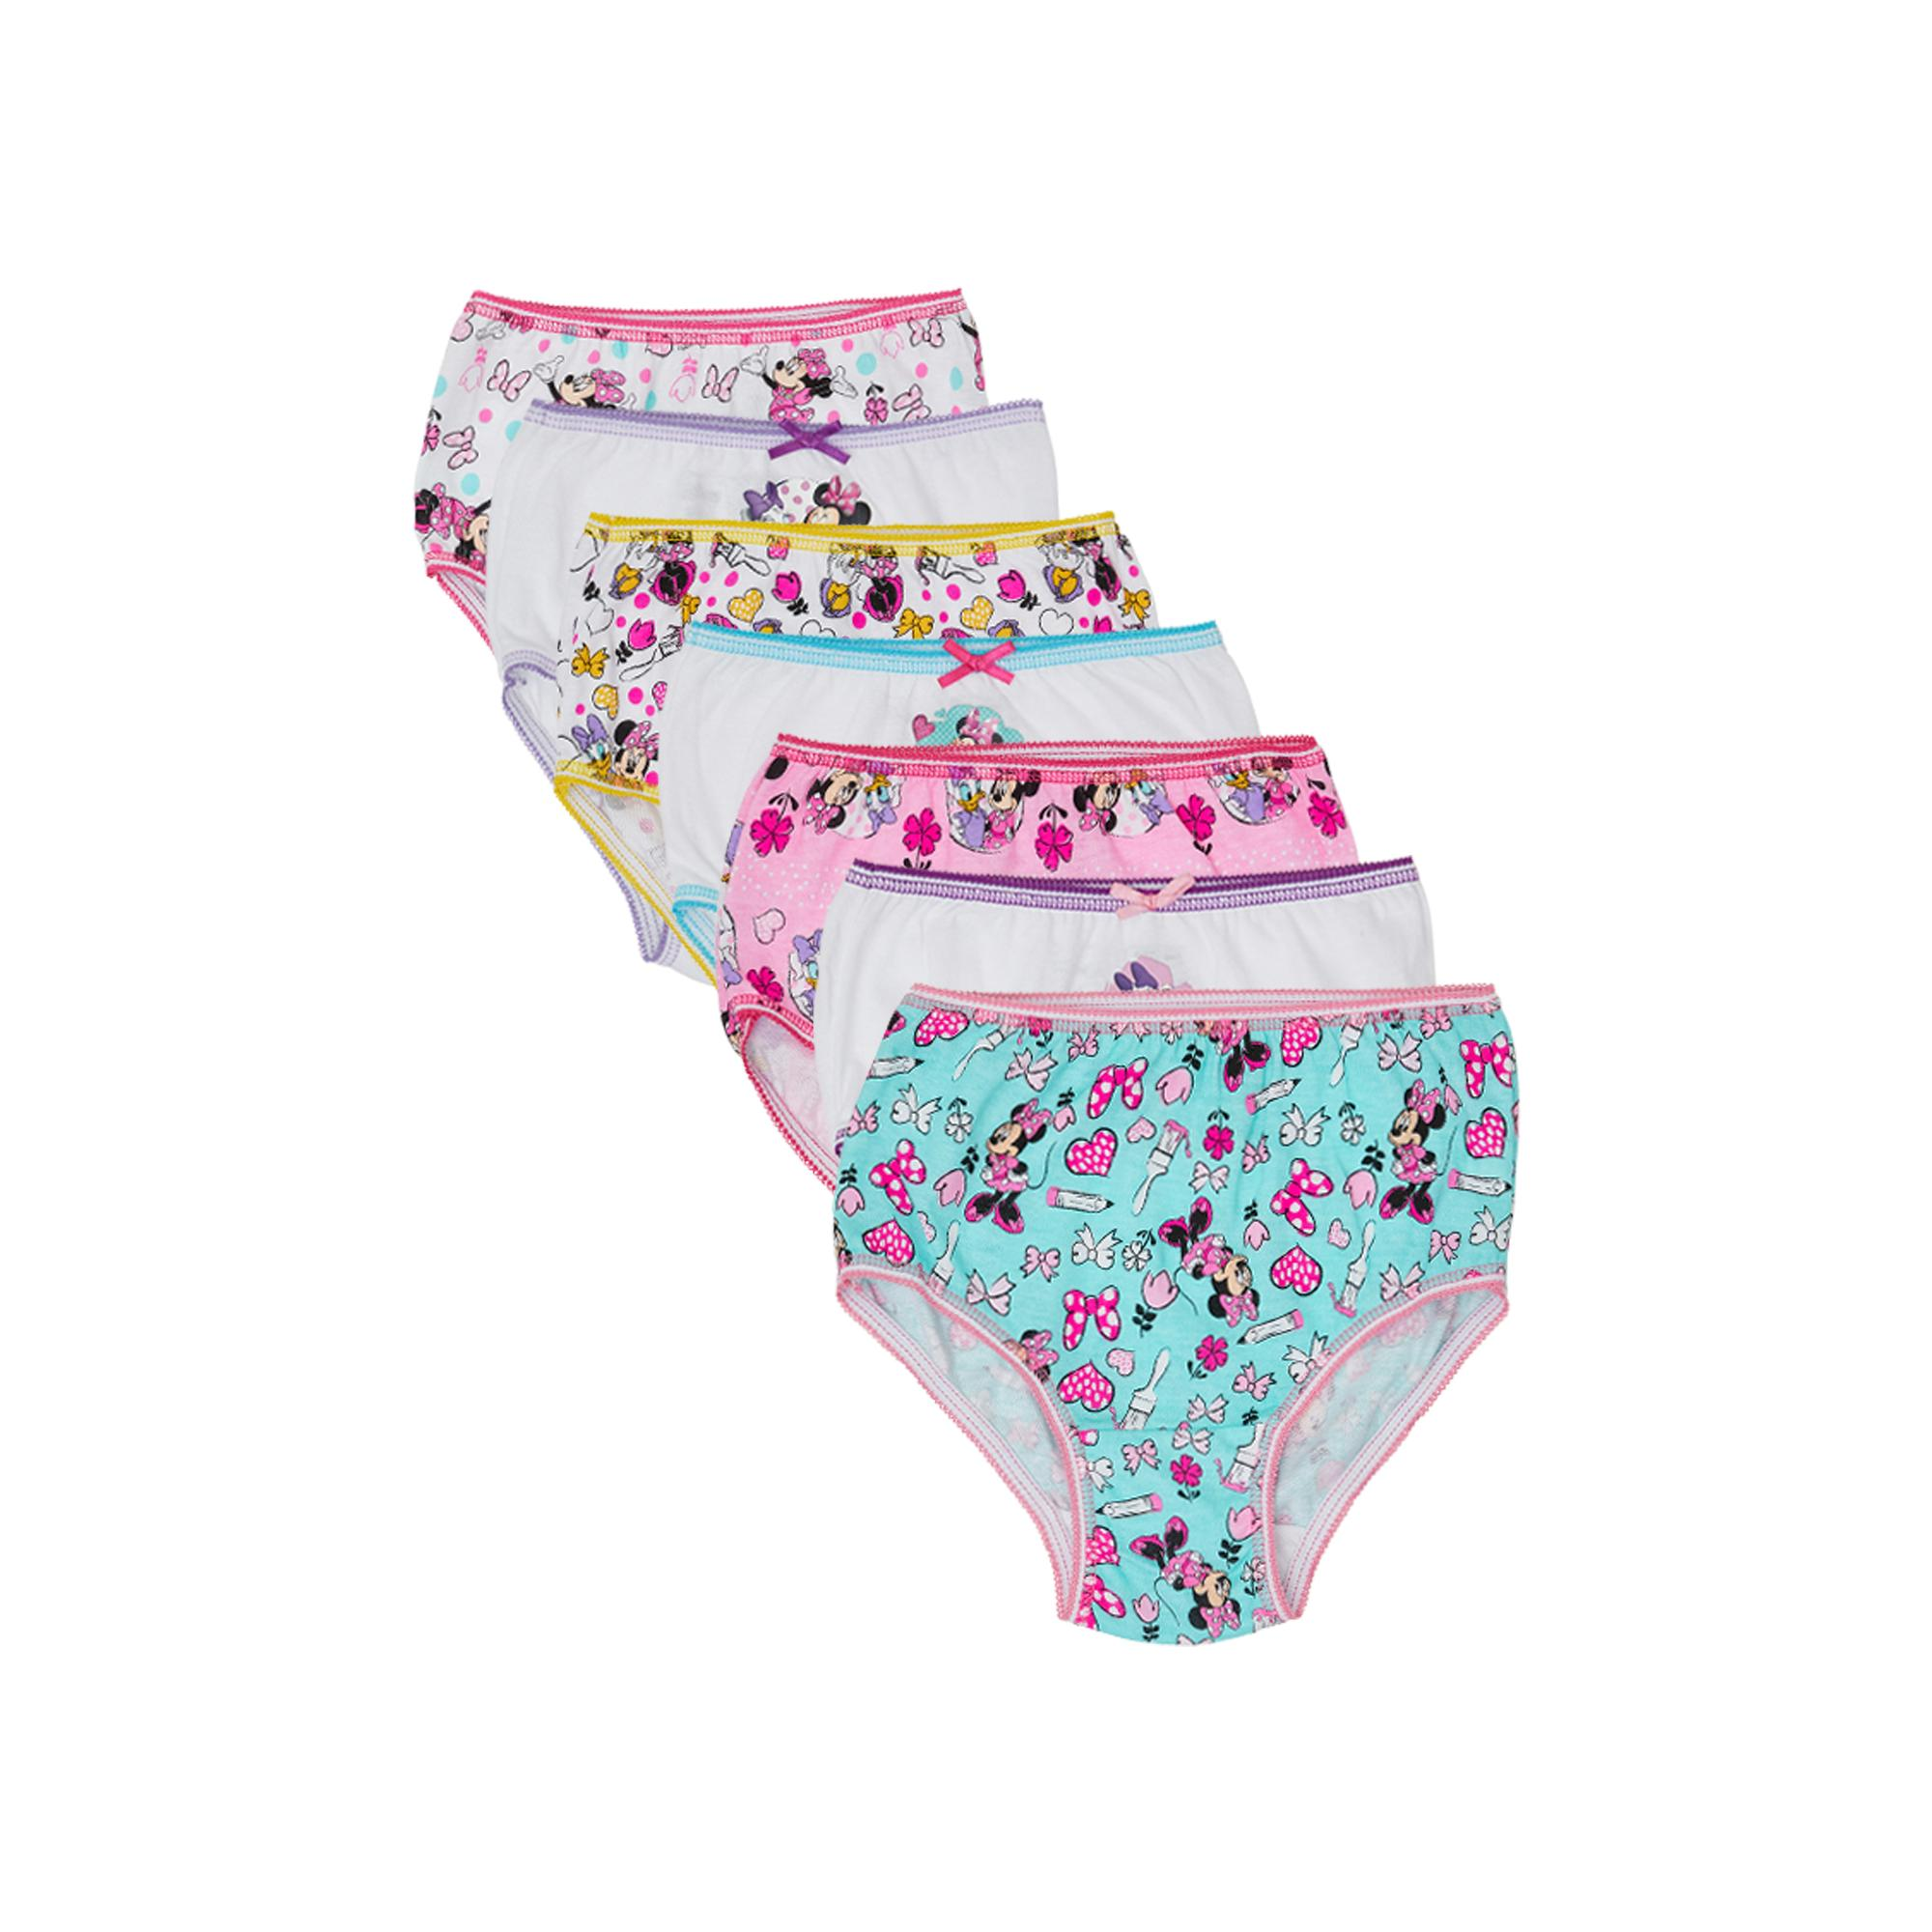 Disney Toddler Girl Underwear, 7-Pack